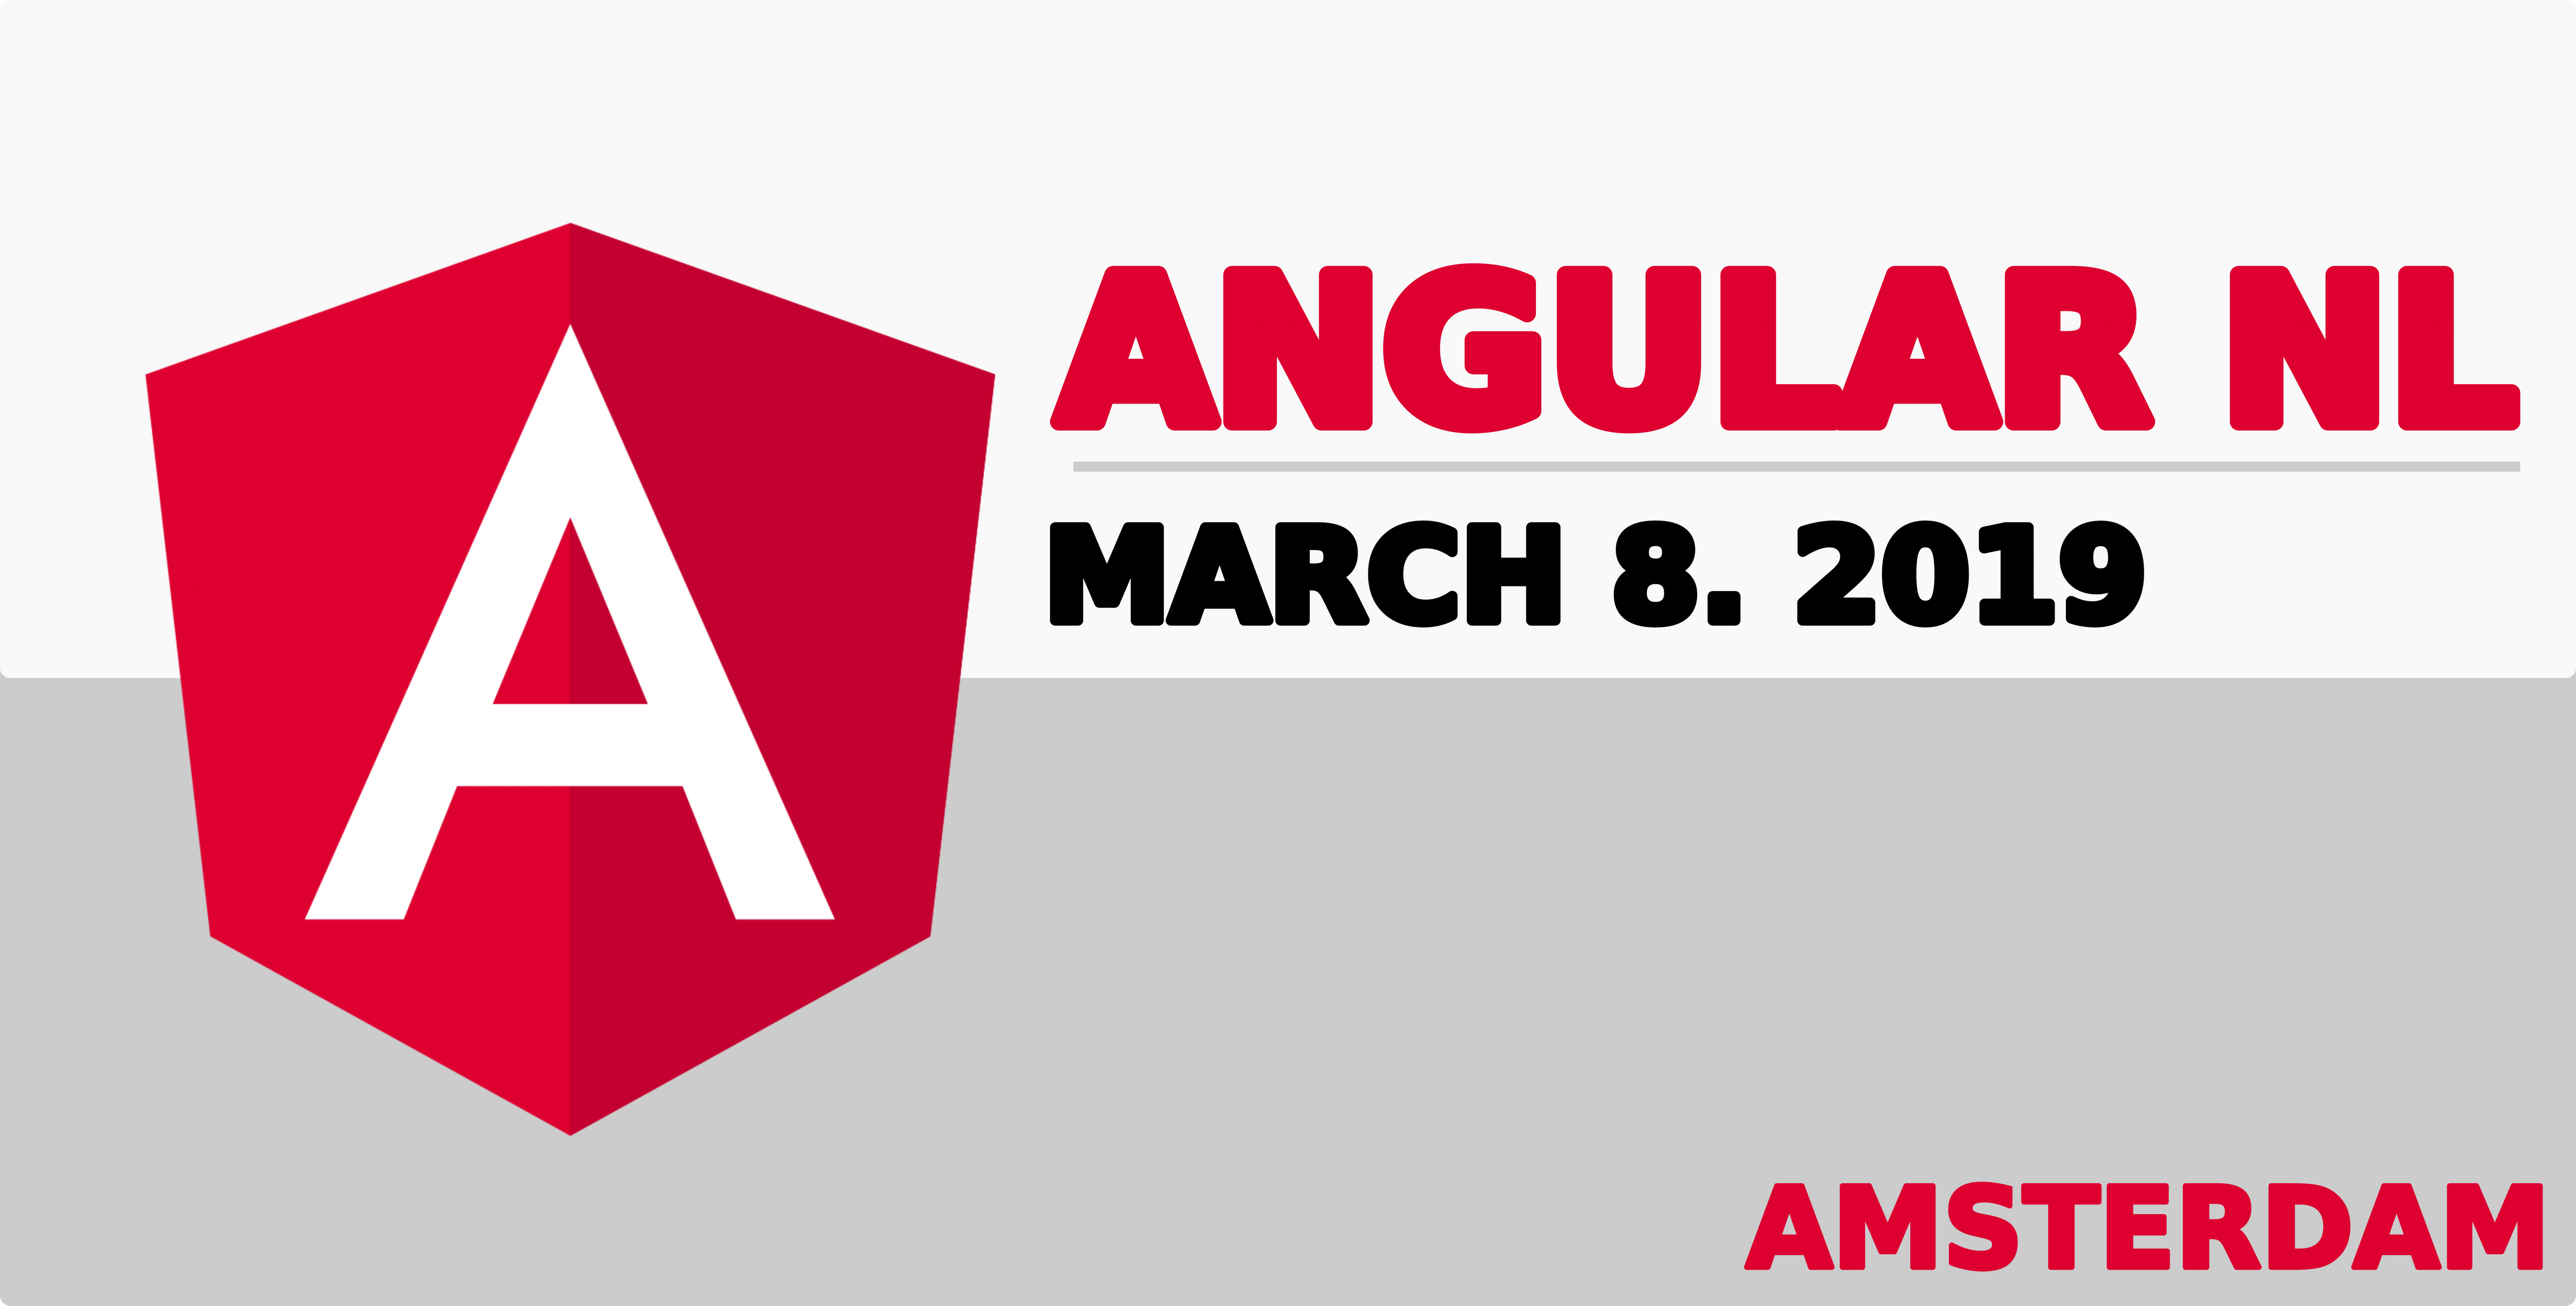 Angular NL 2019